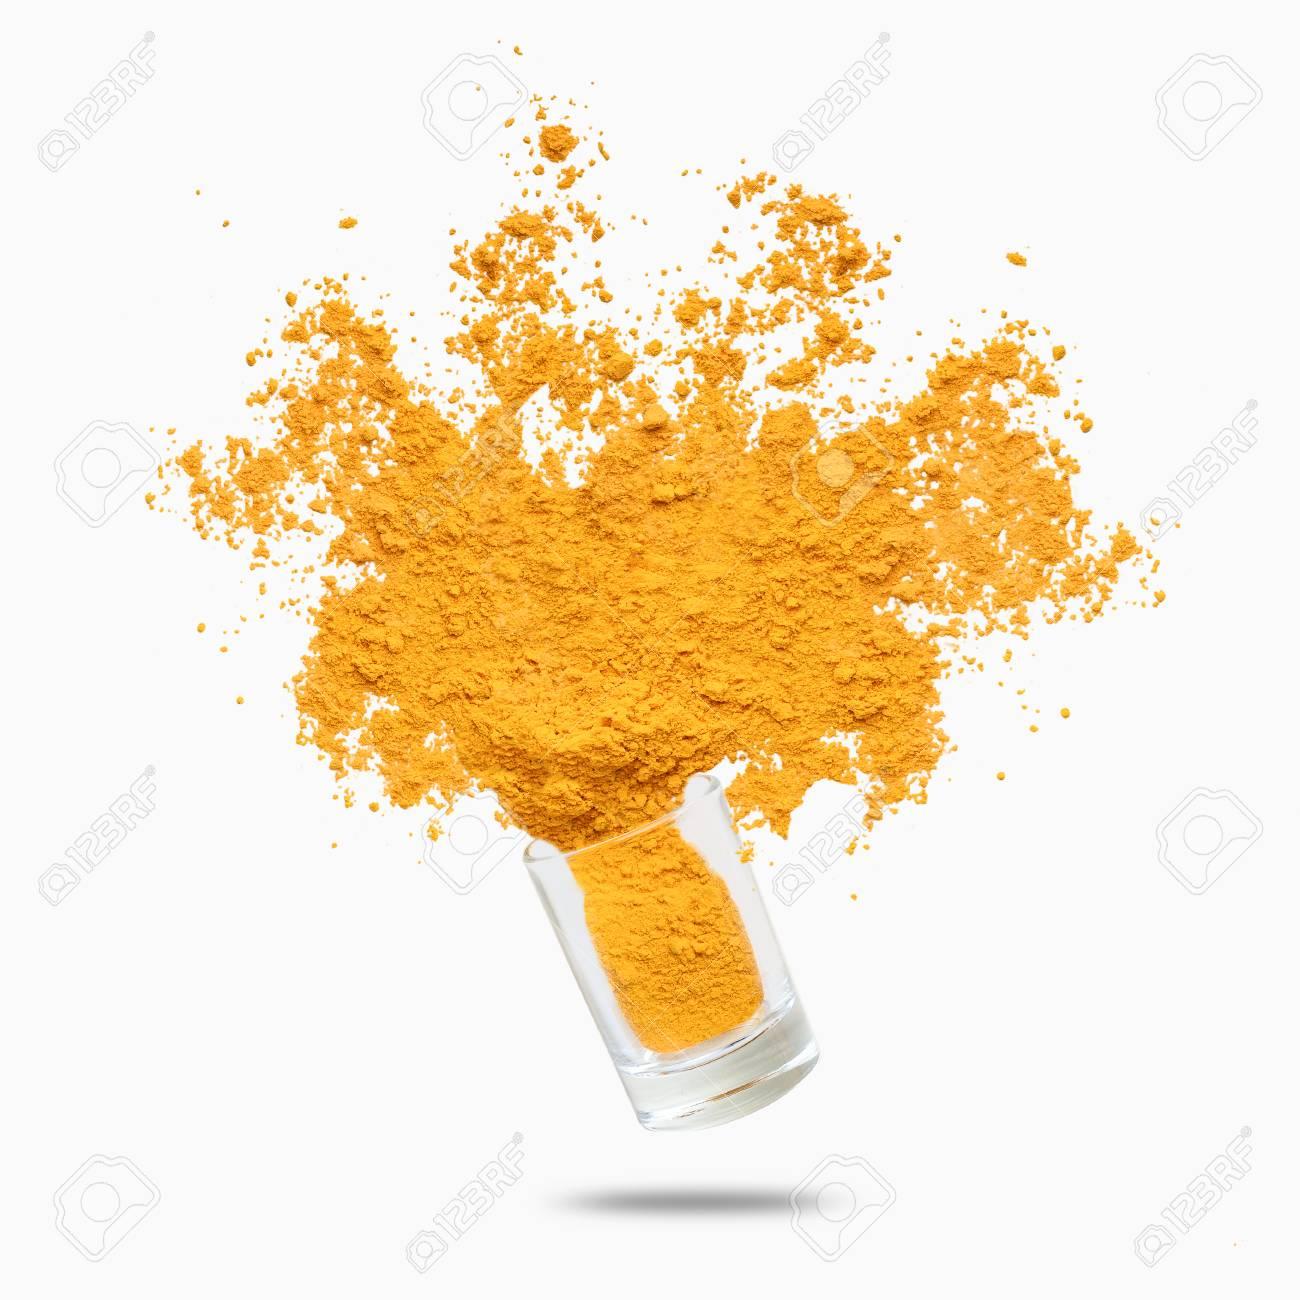 Condiment splash. Yellow turmeric powder flying, isolated on white background - 118032787